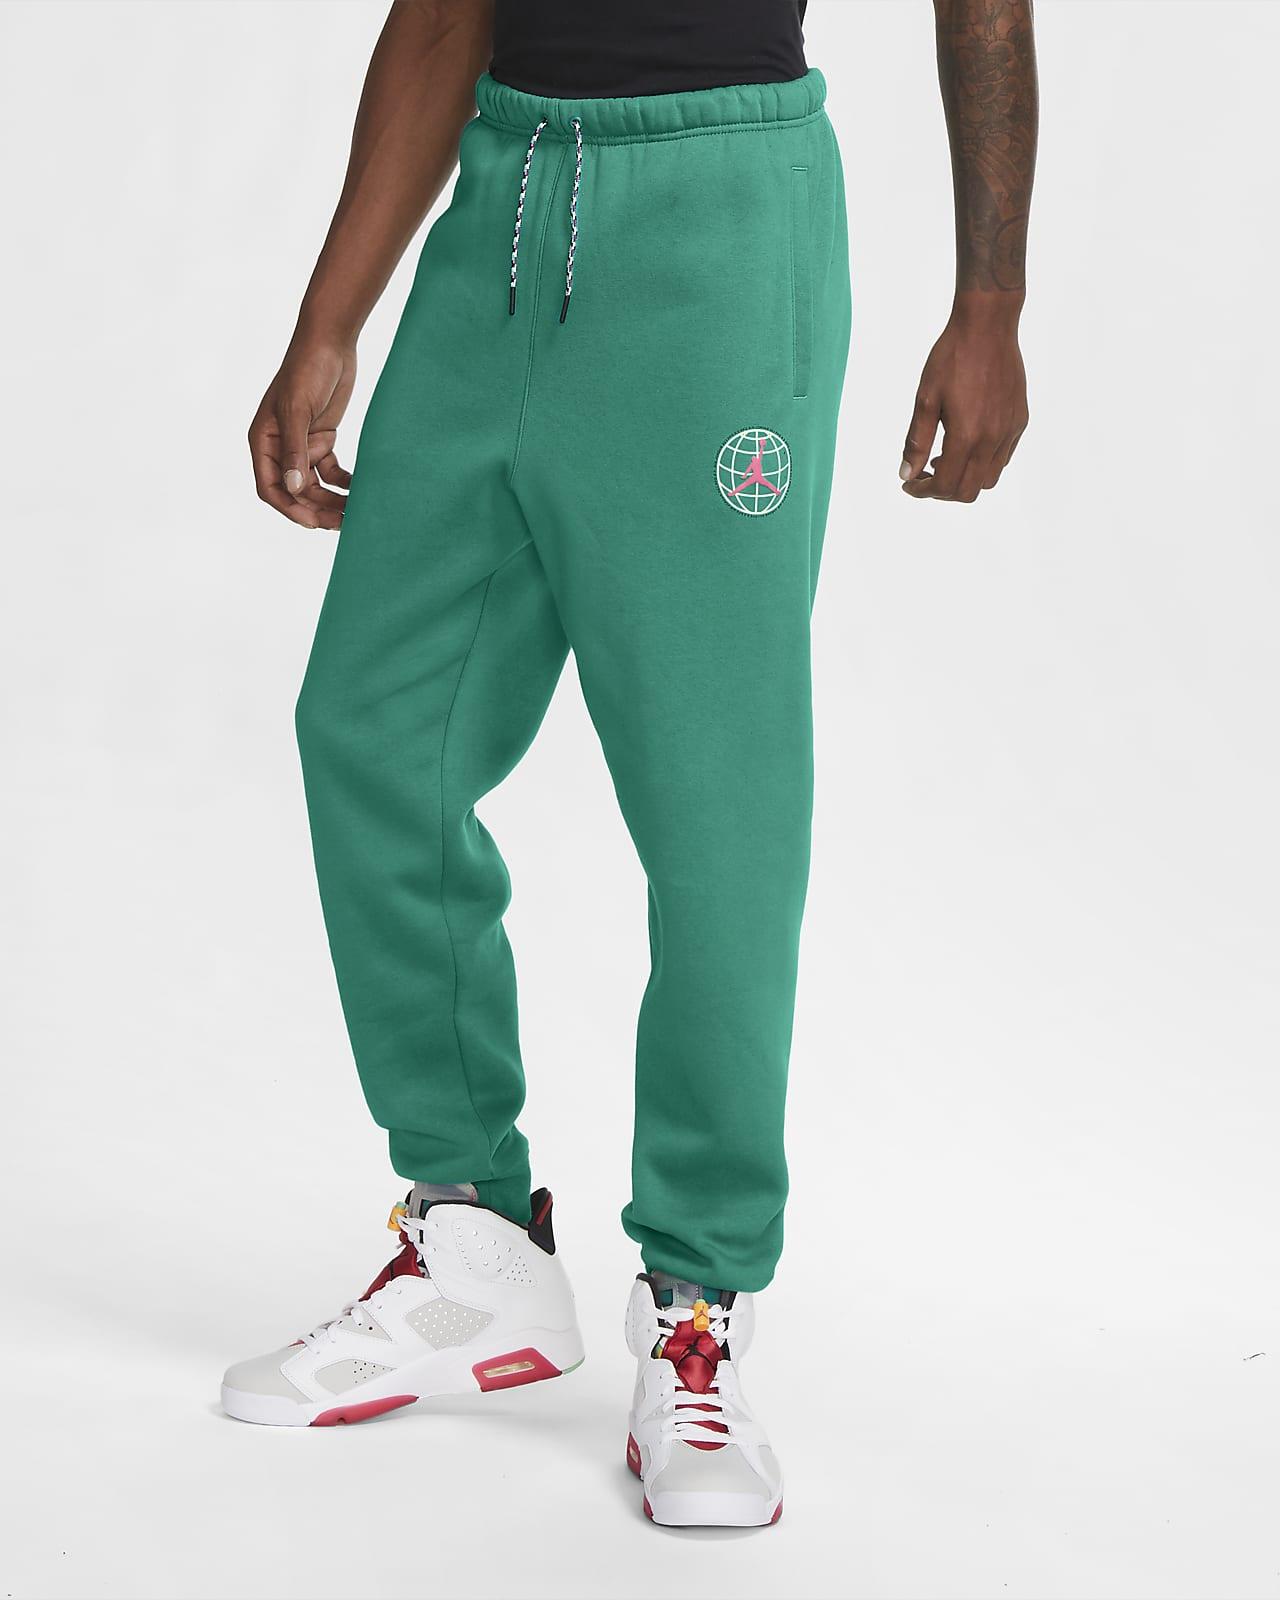 Pantalon en tissu Fleece Jordan Winter Utility pour Homme